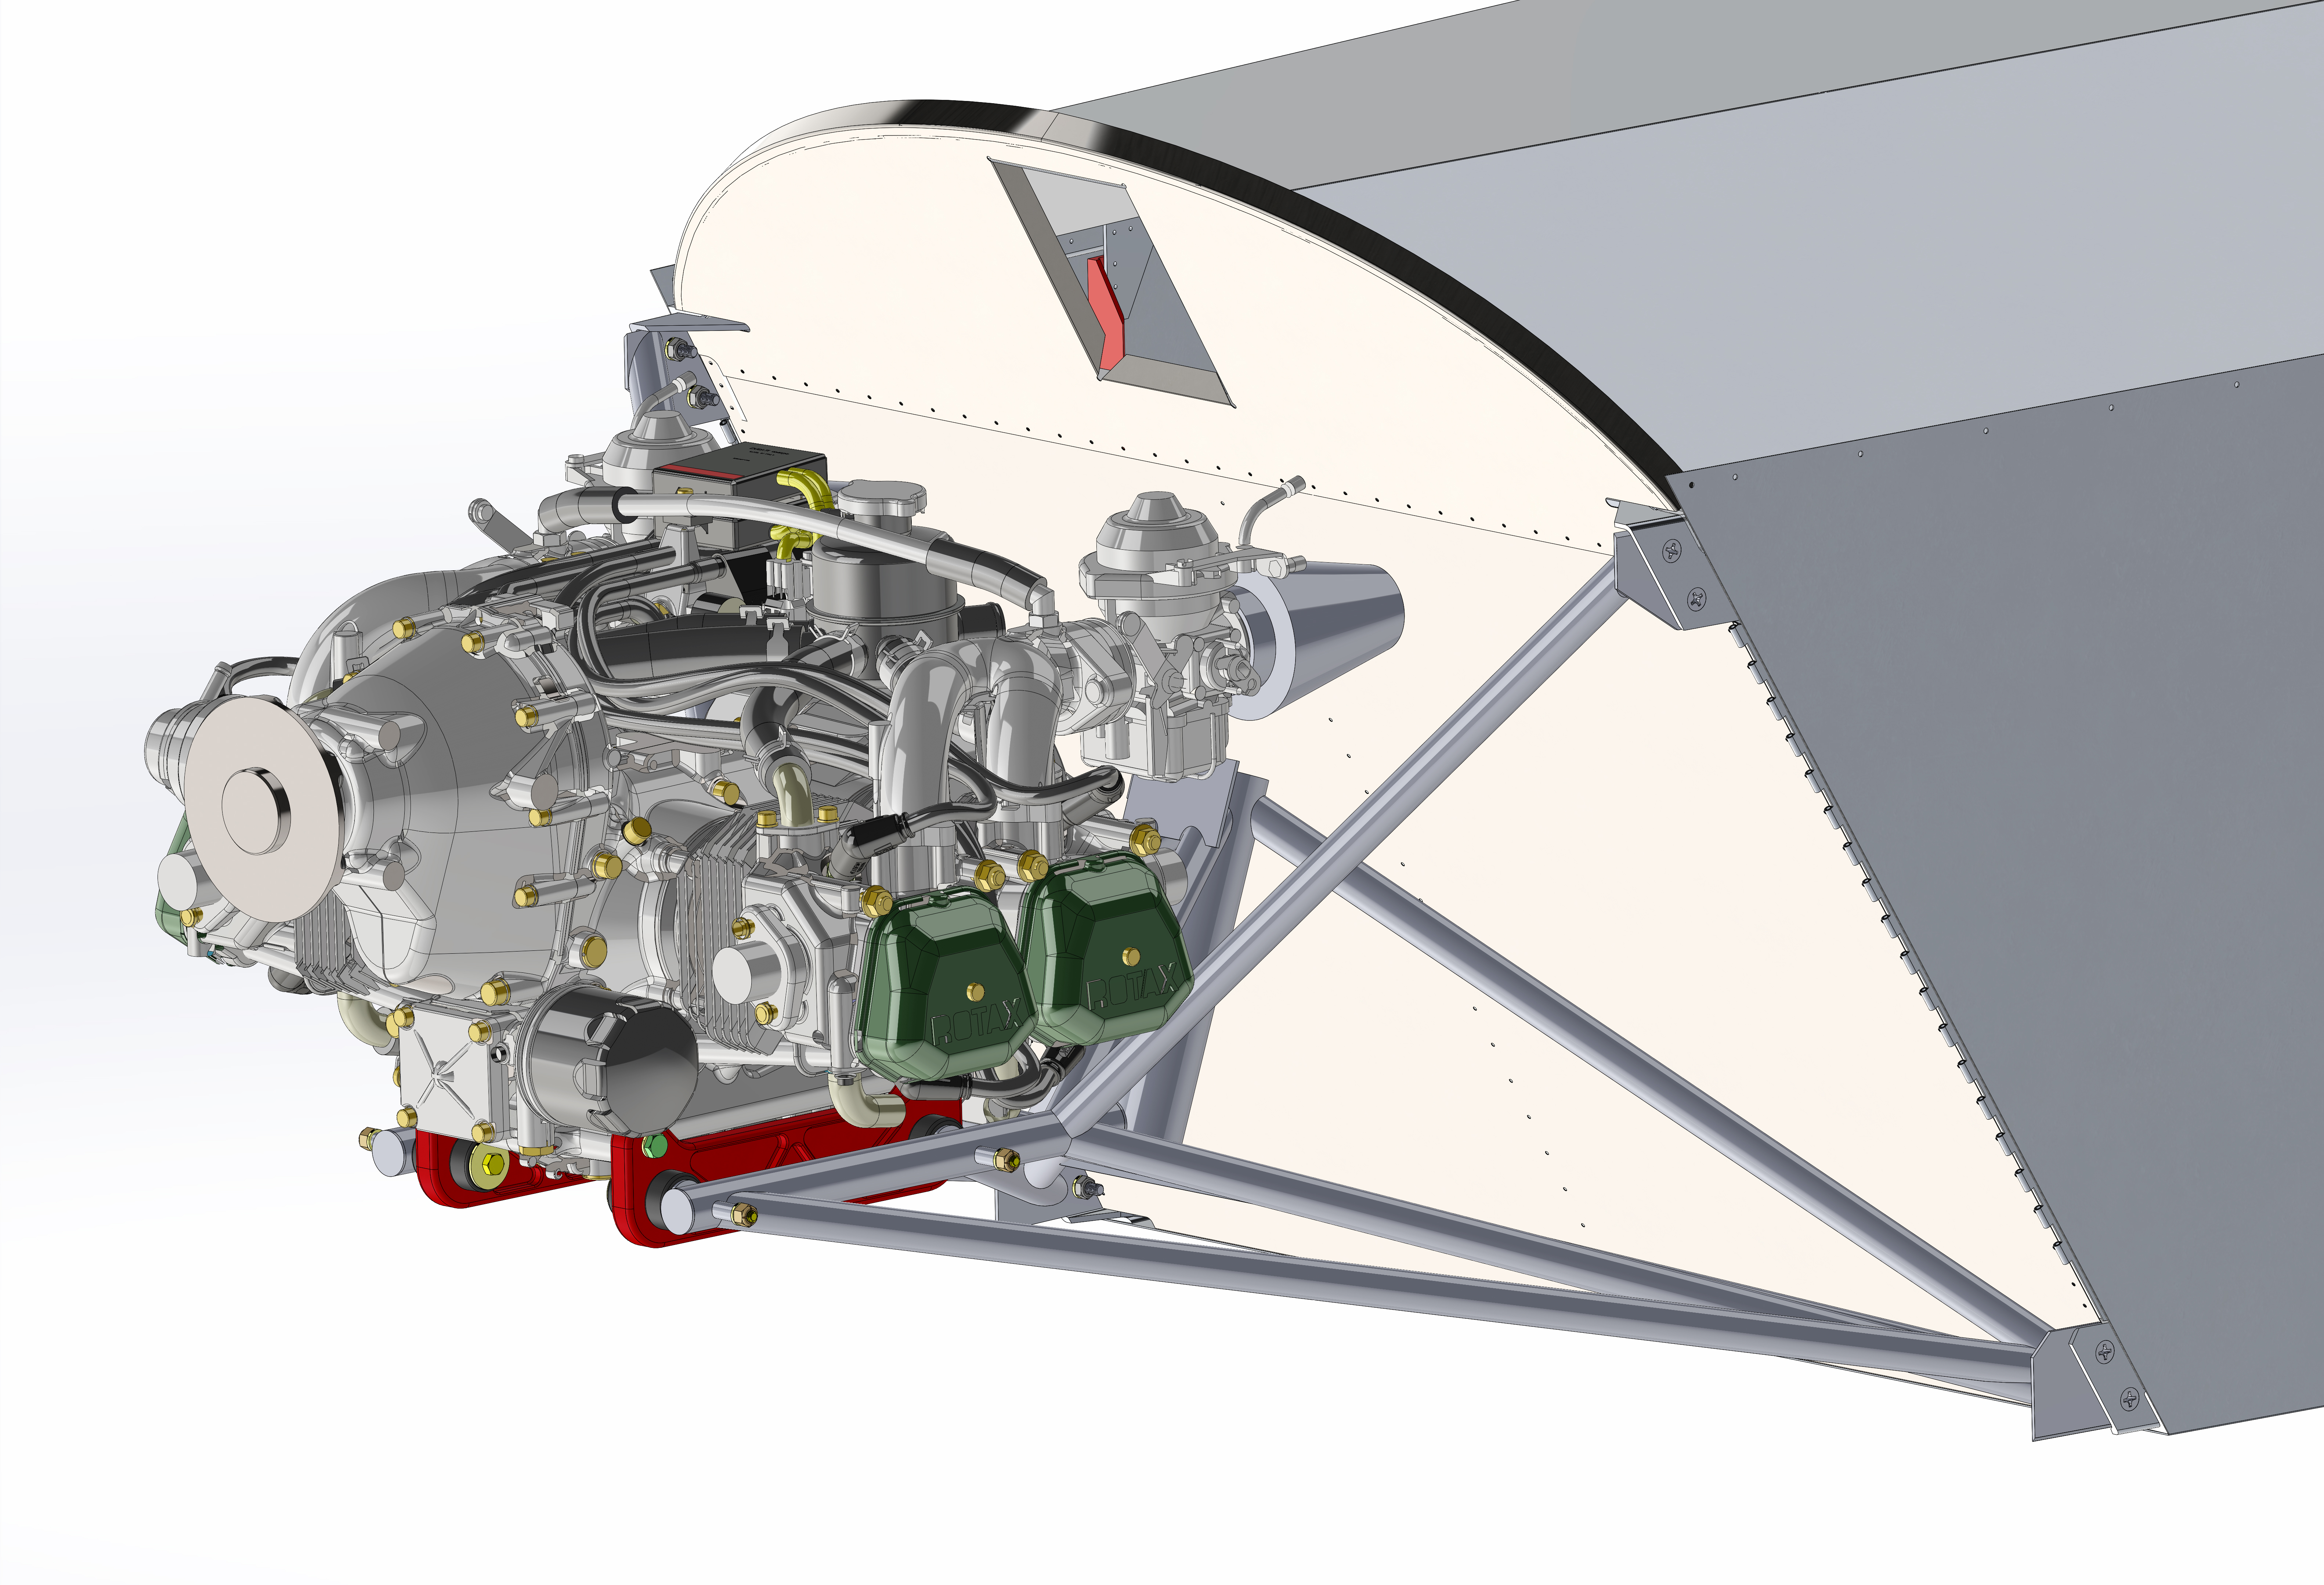 Sonex Aircraft AeroConversions Product Line Introduces Rotax